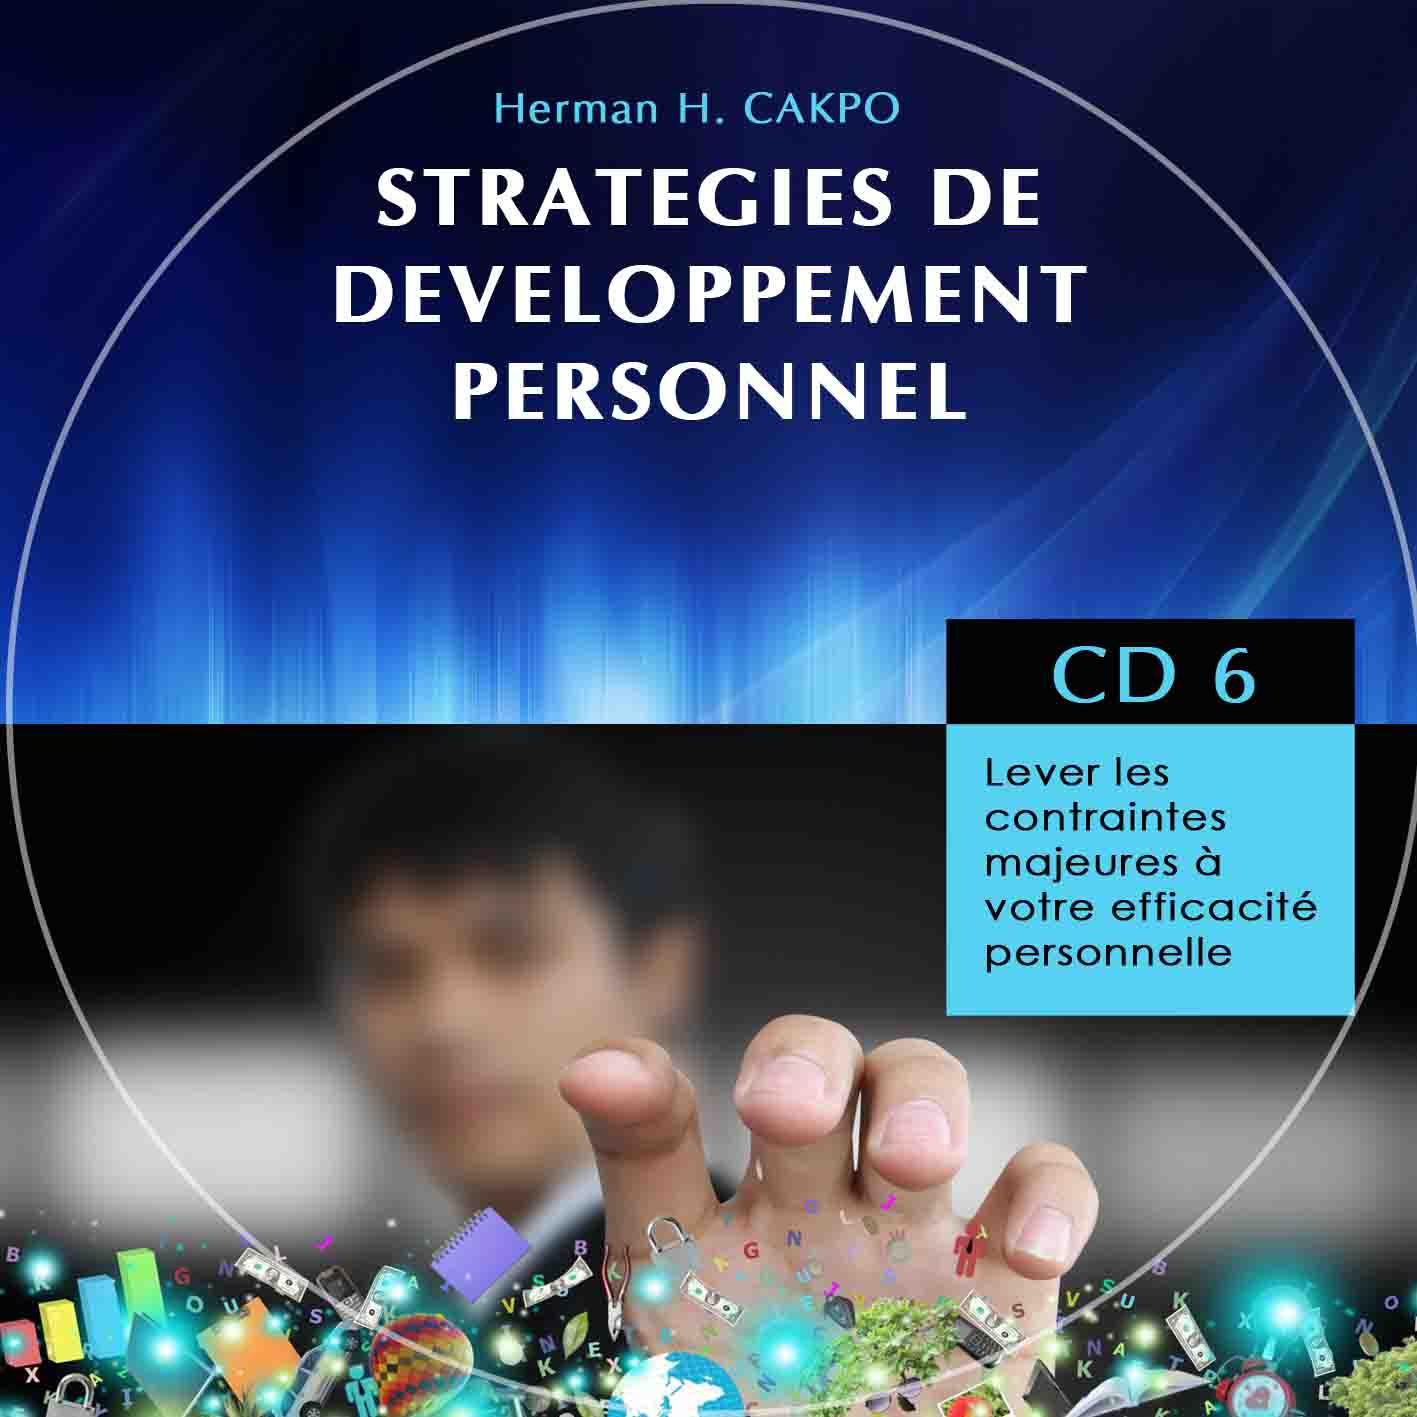 CD- 6